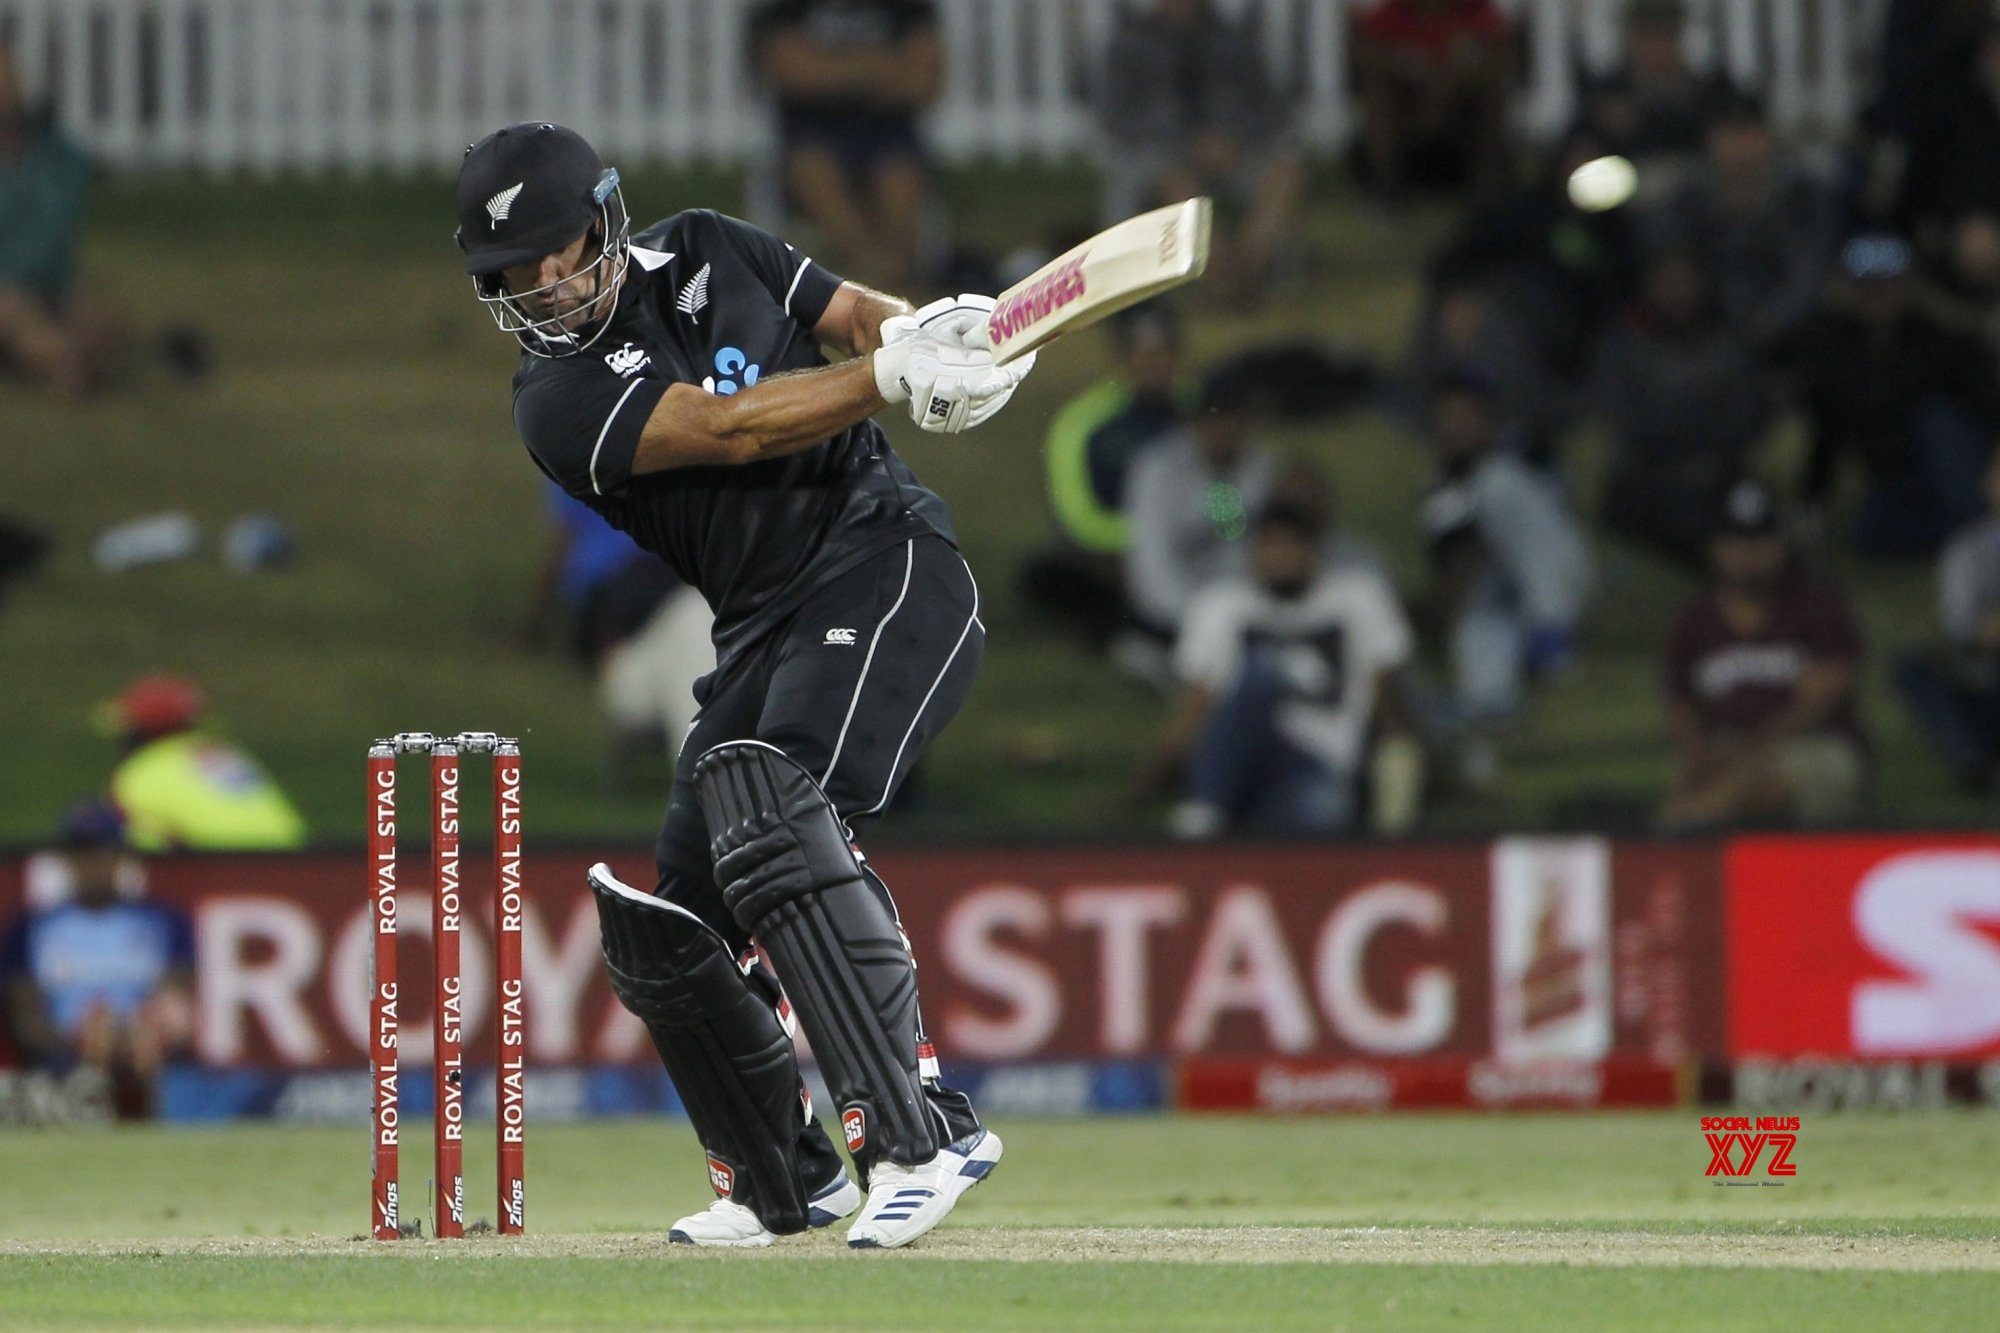 Mount Maunganui: 3rd ODI - India Vs New Zealand (Batch - 12) #Gallery